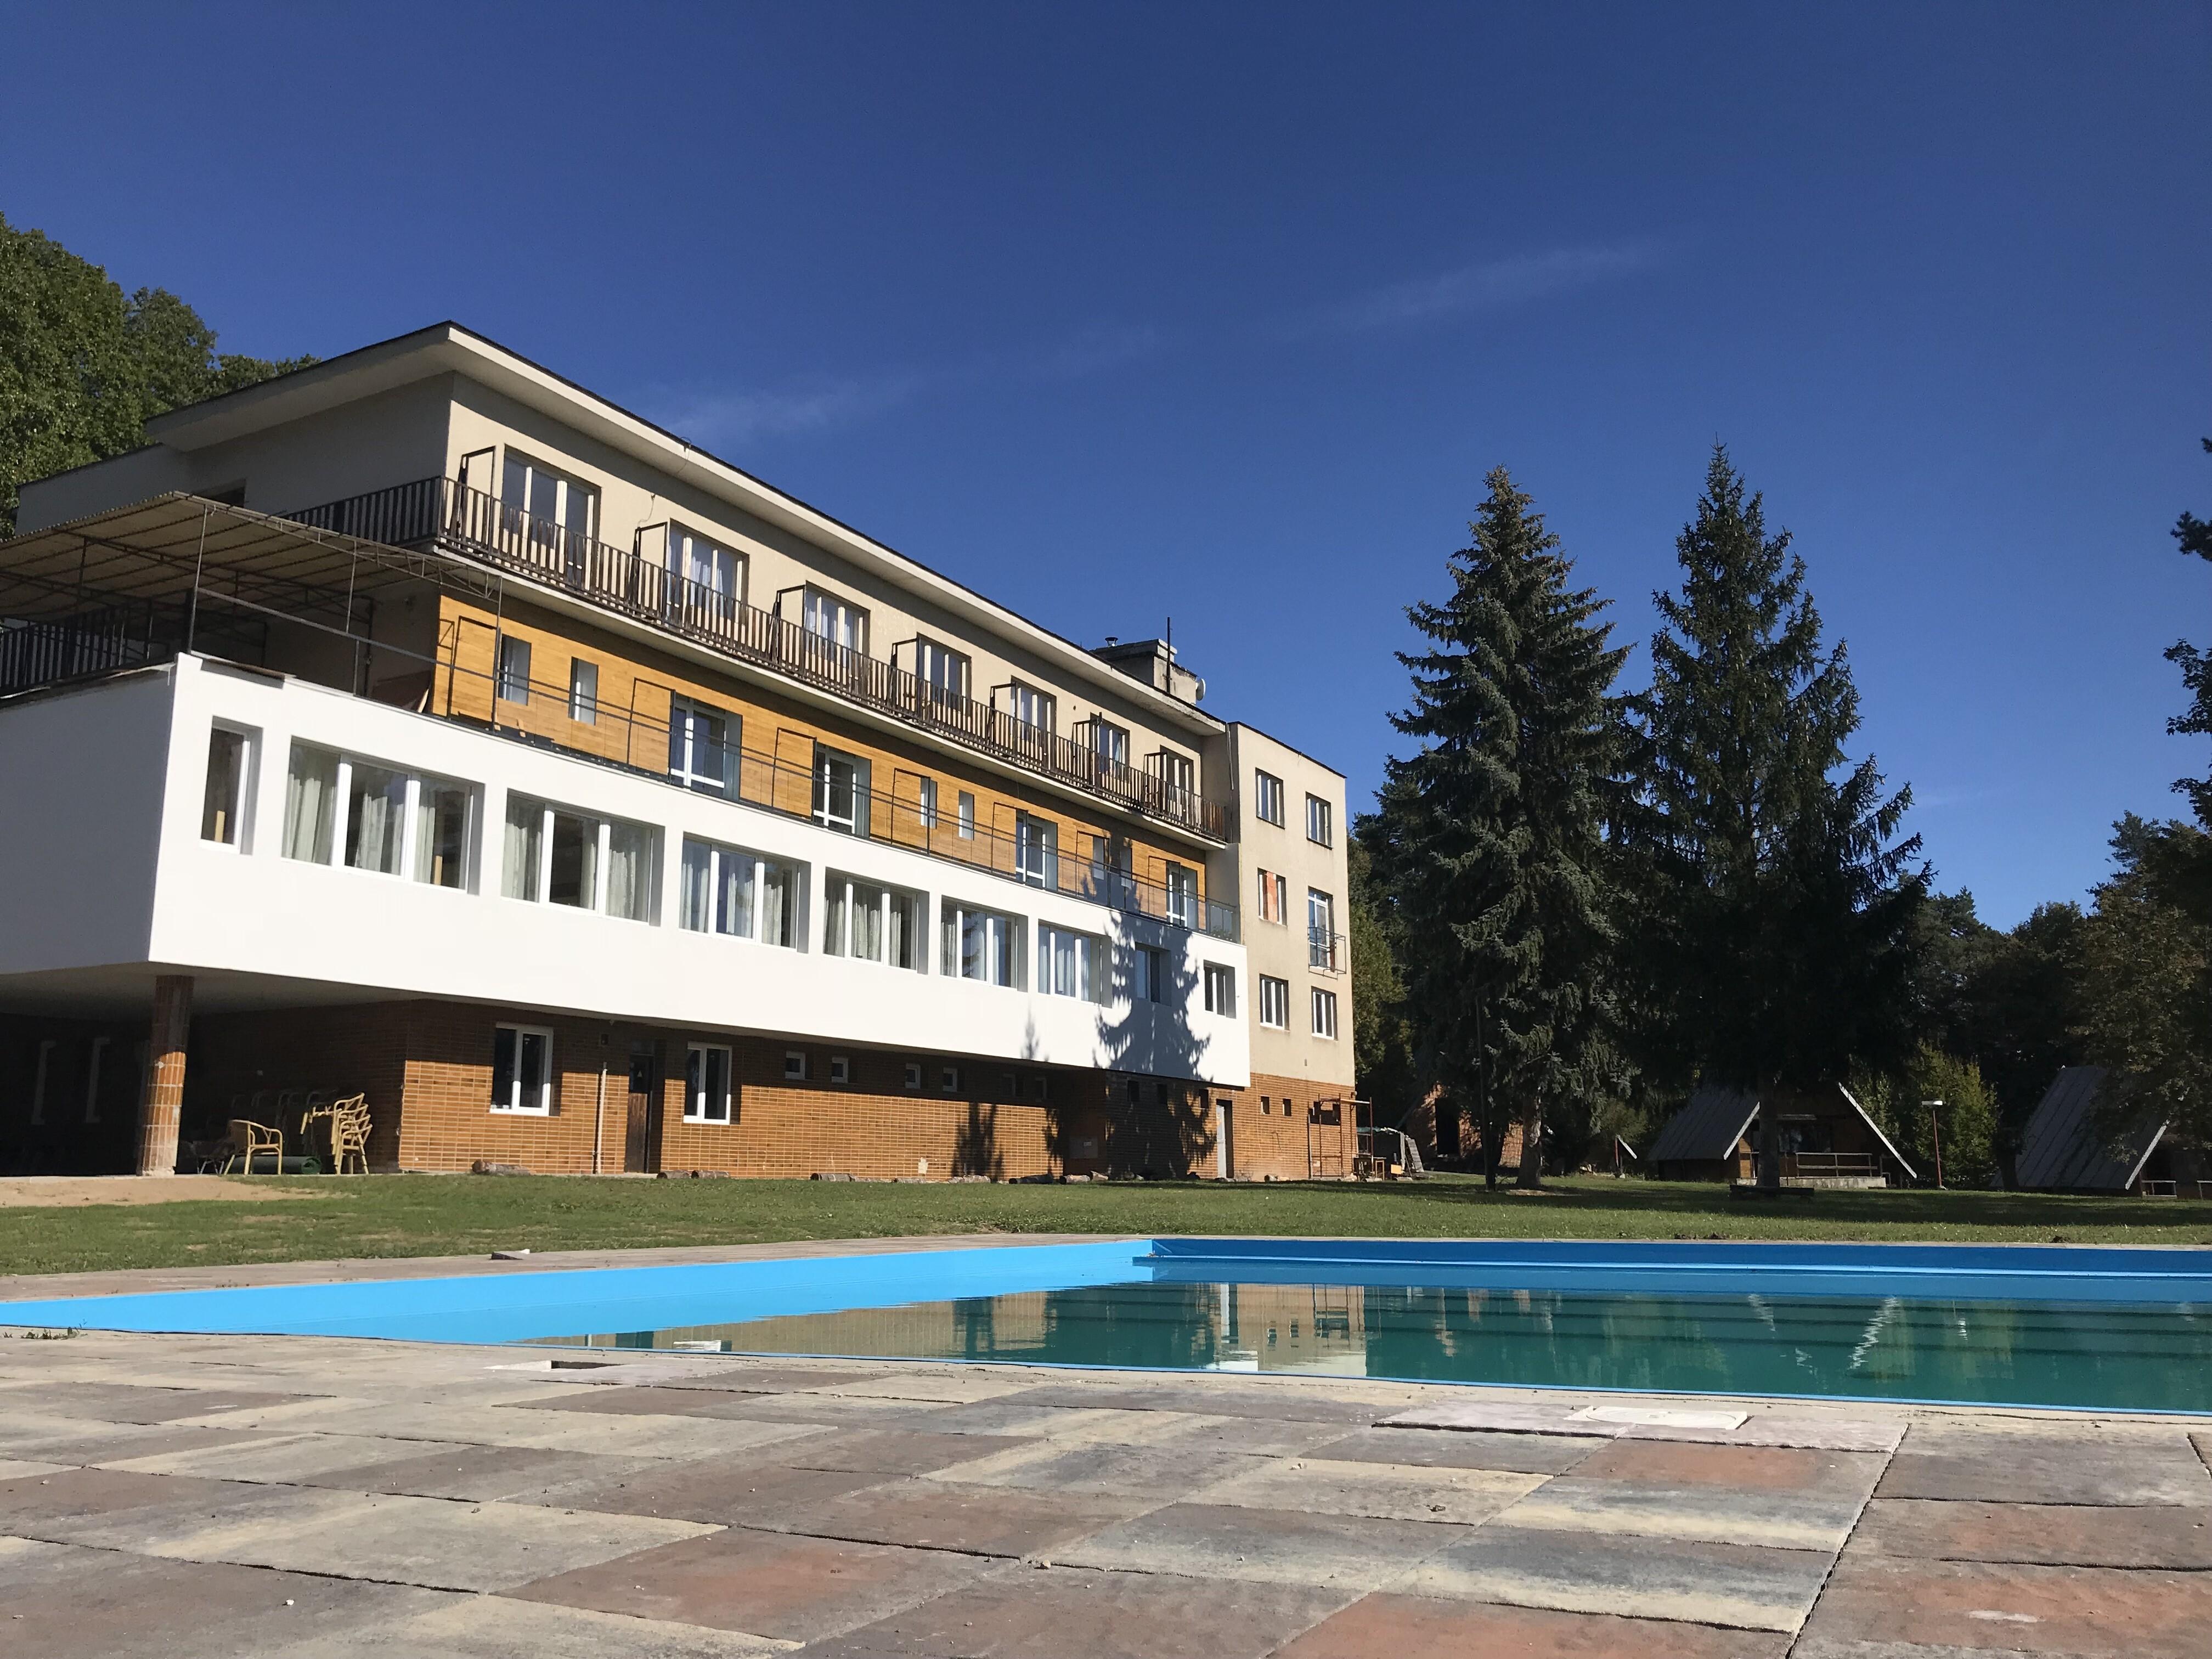 Hotel Kochau